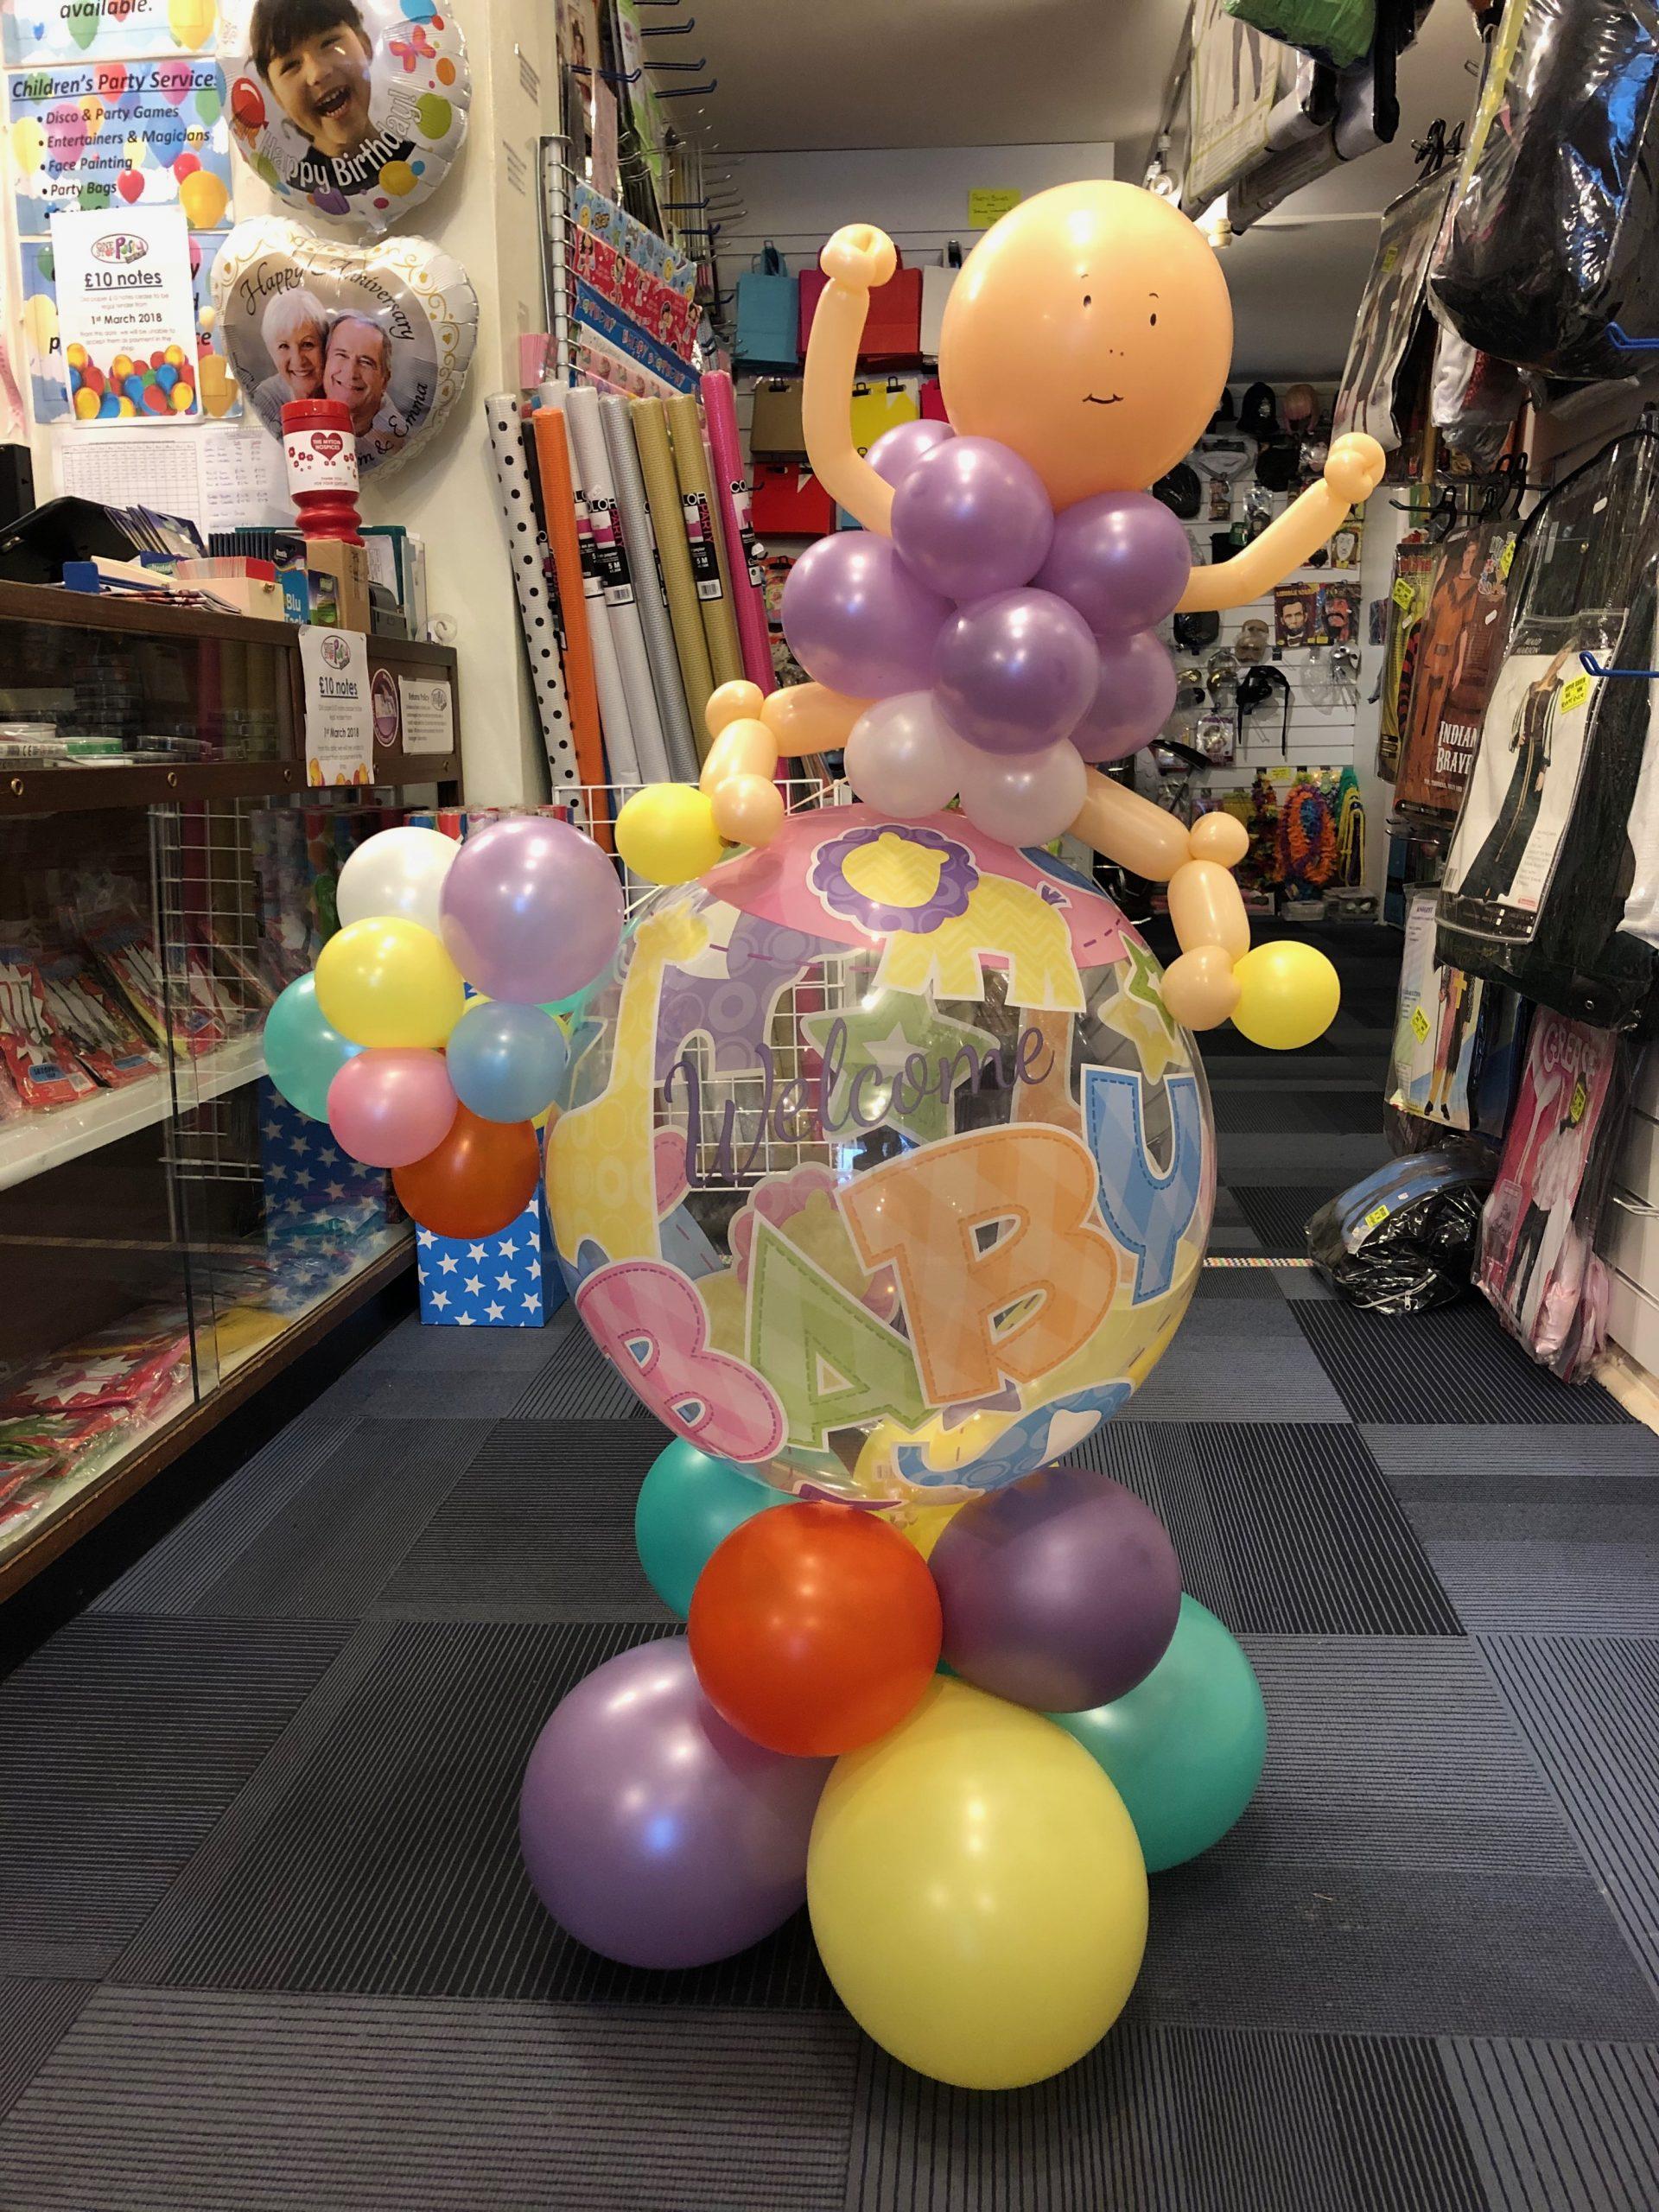 Balloon baby sitting on decoration